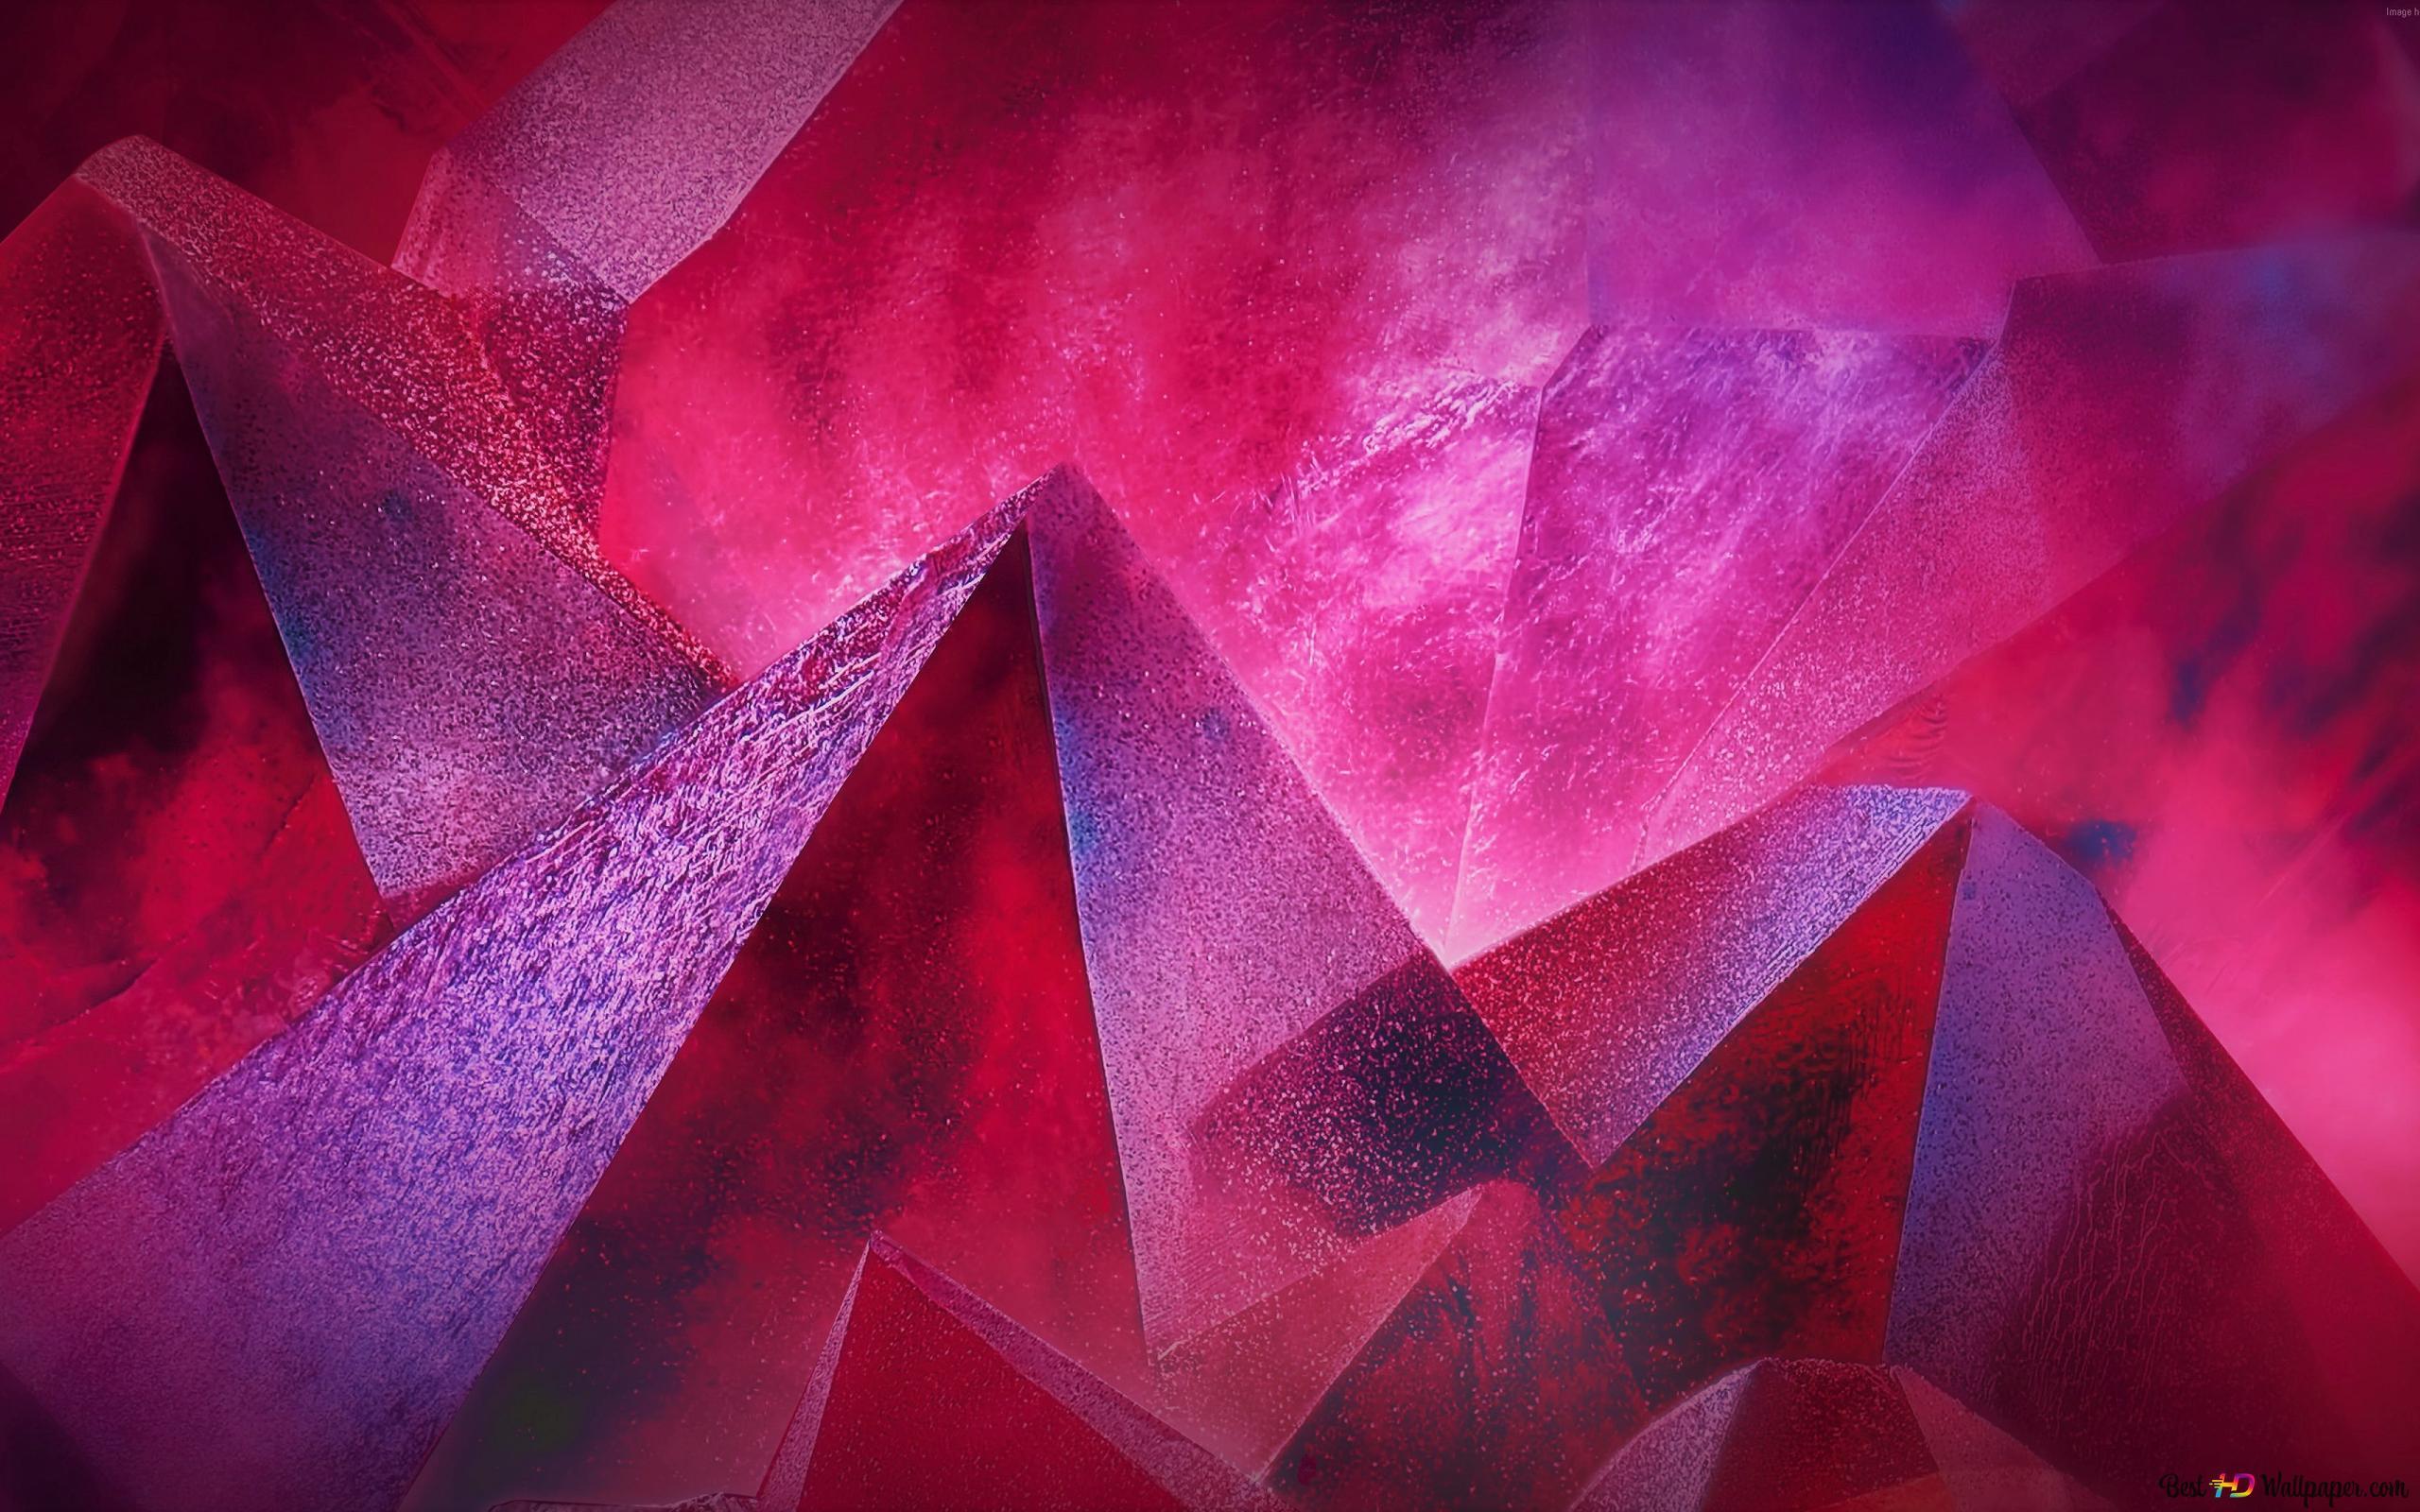 Pink Cyrstal Hd Wallpaper Download